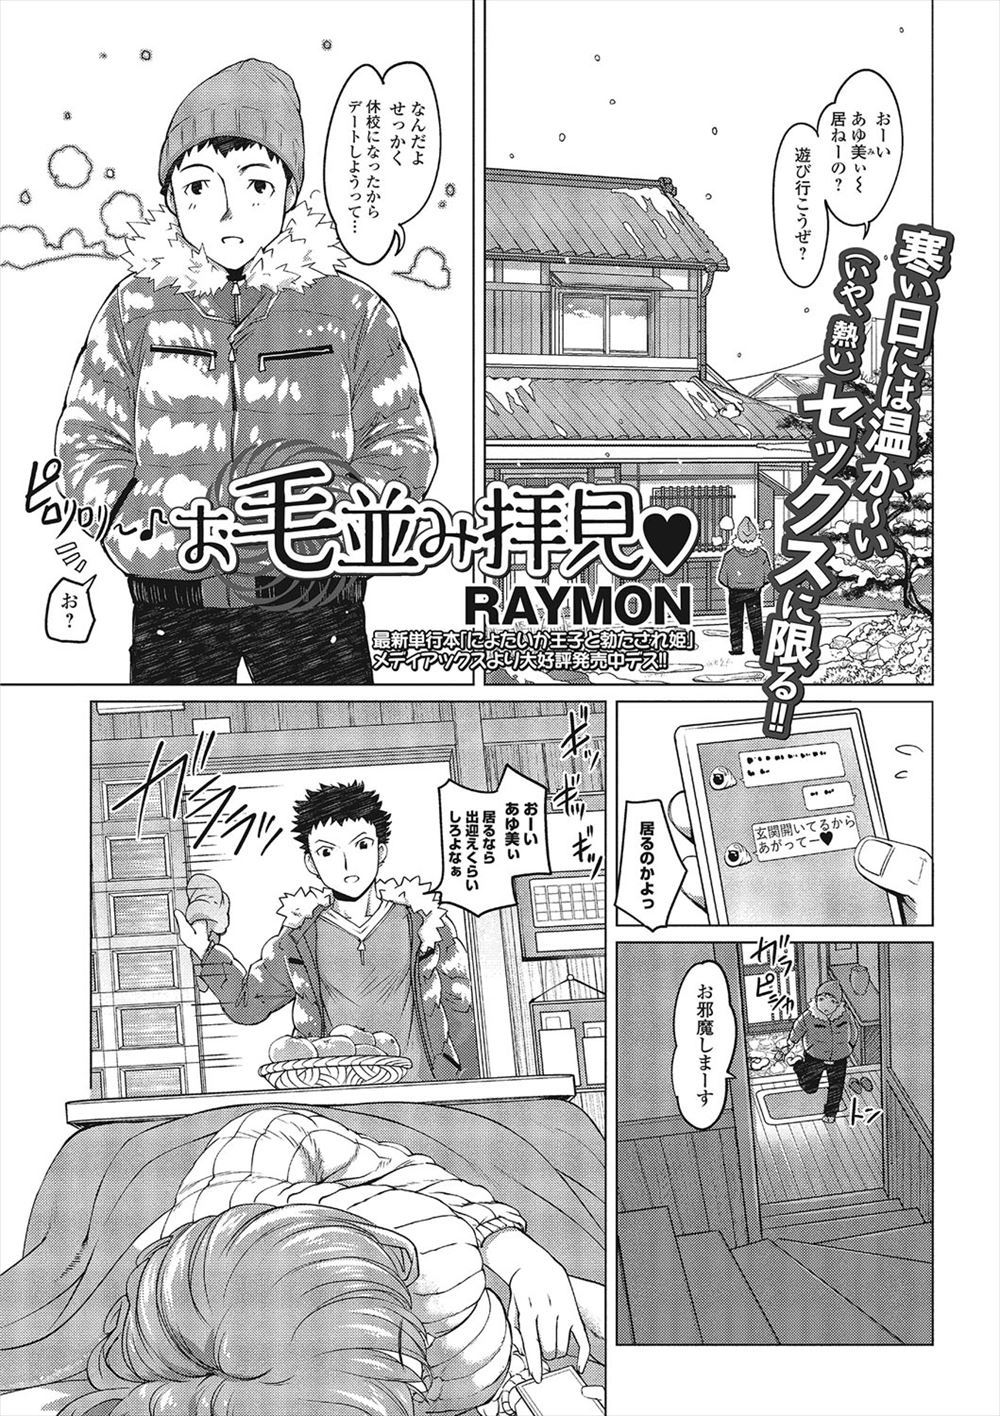 [RAYMON] お毛並み拝見 (1)